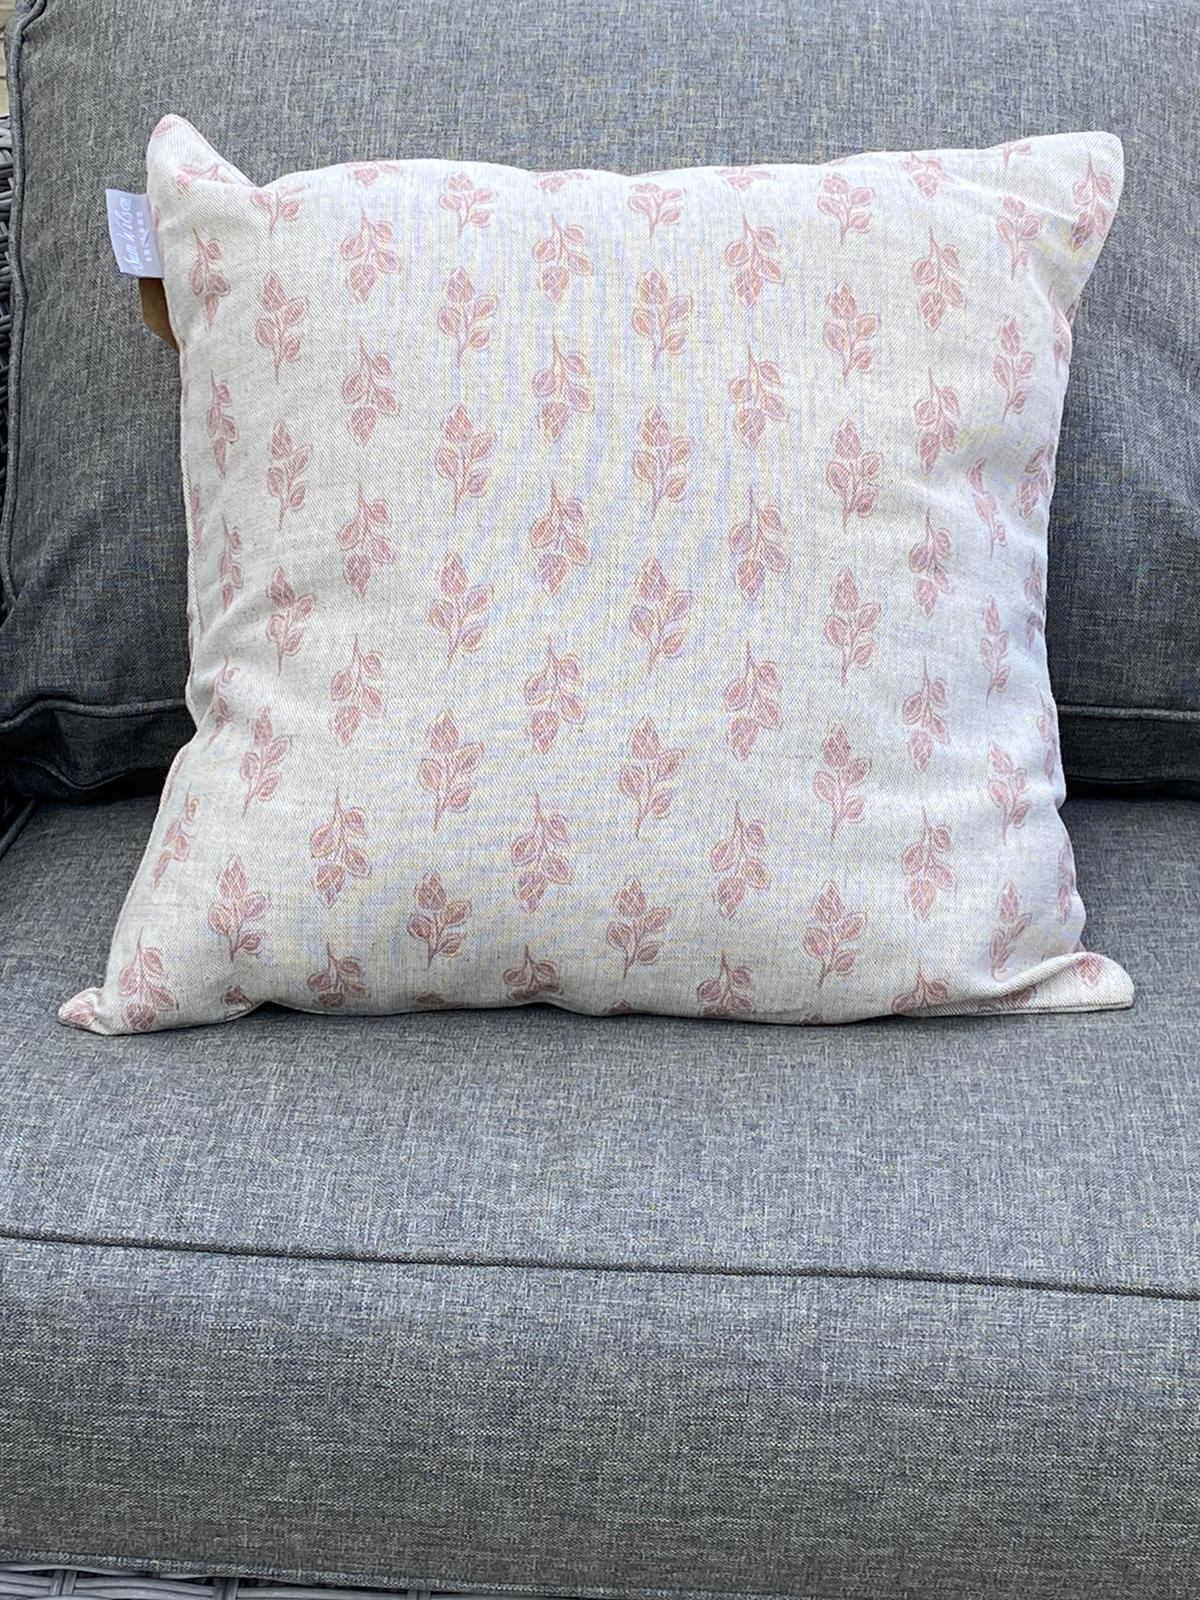 Sam Wilson Feather Cushions - Pink Flora